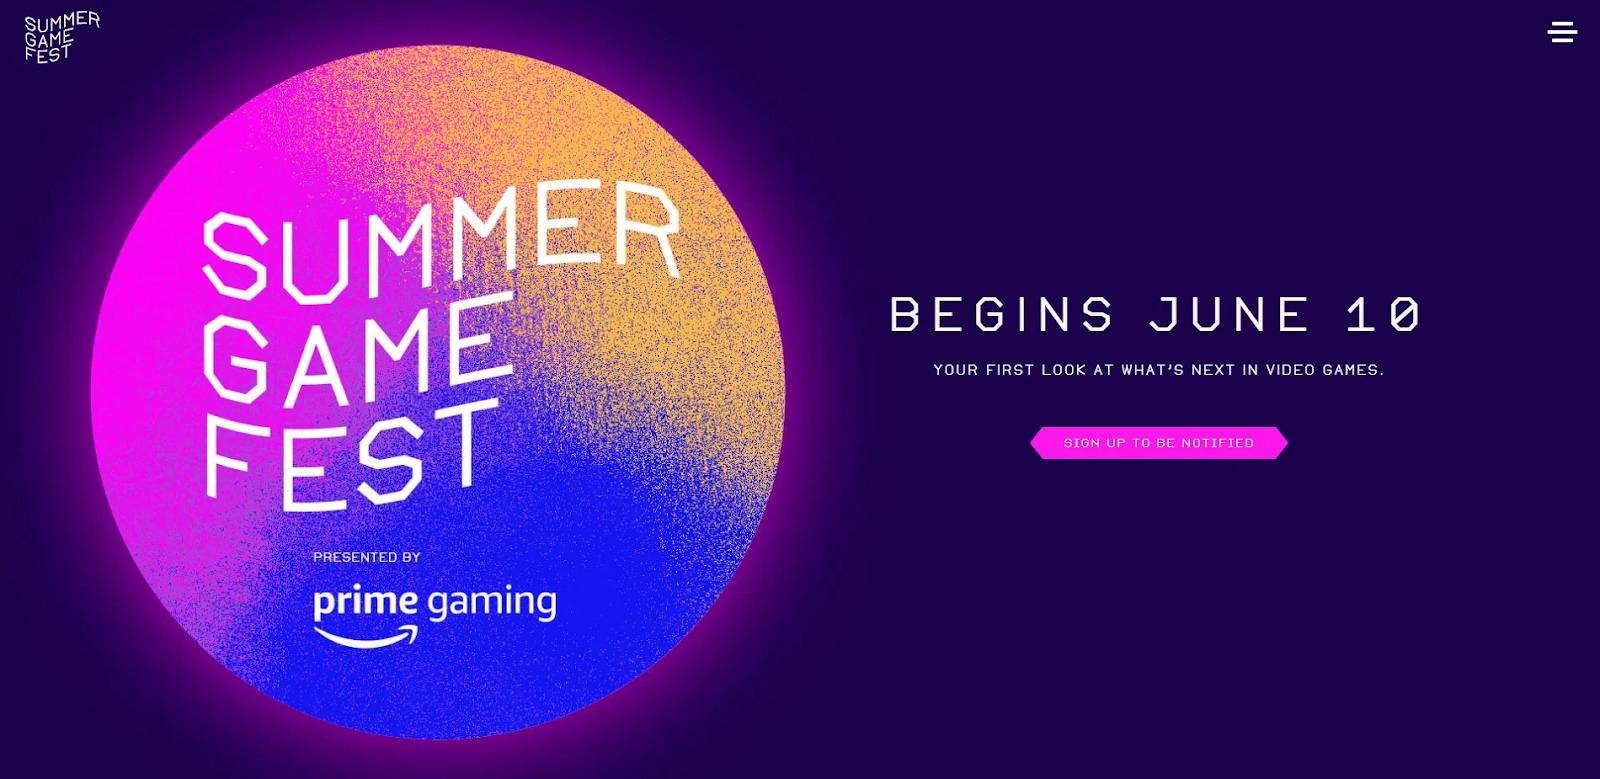 Summer Game Fest Dates